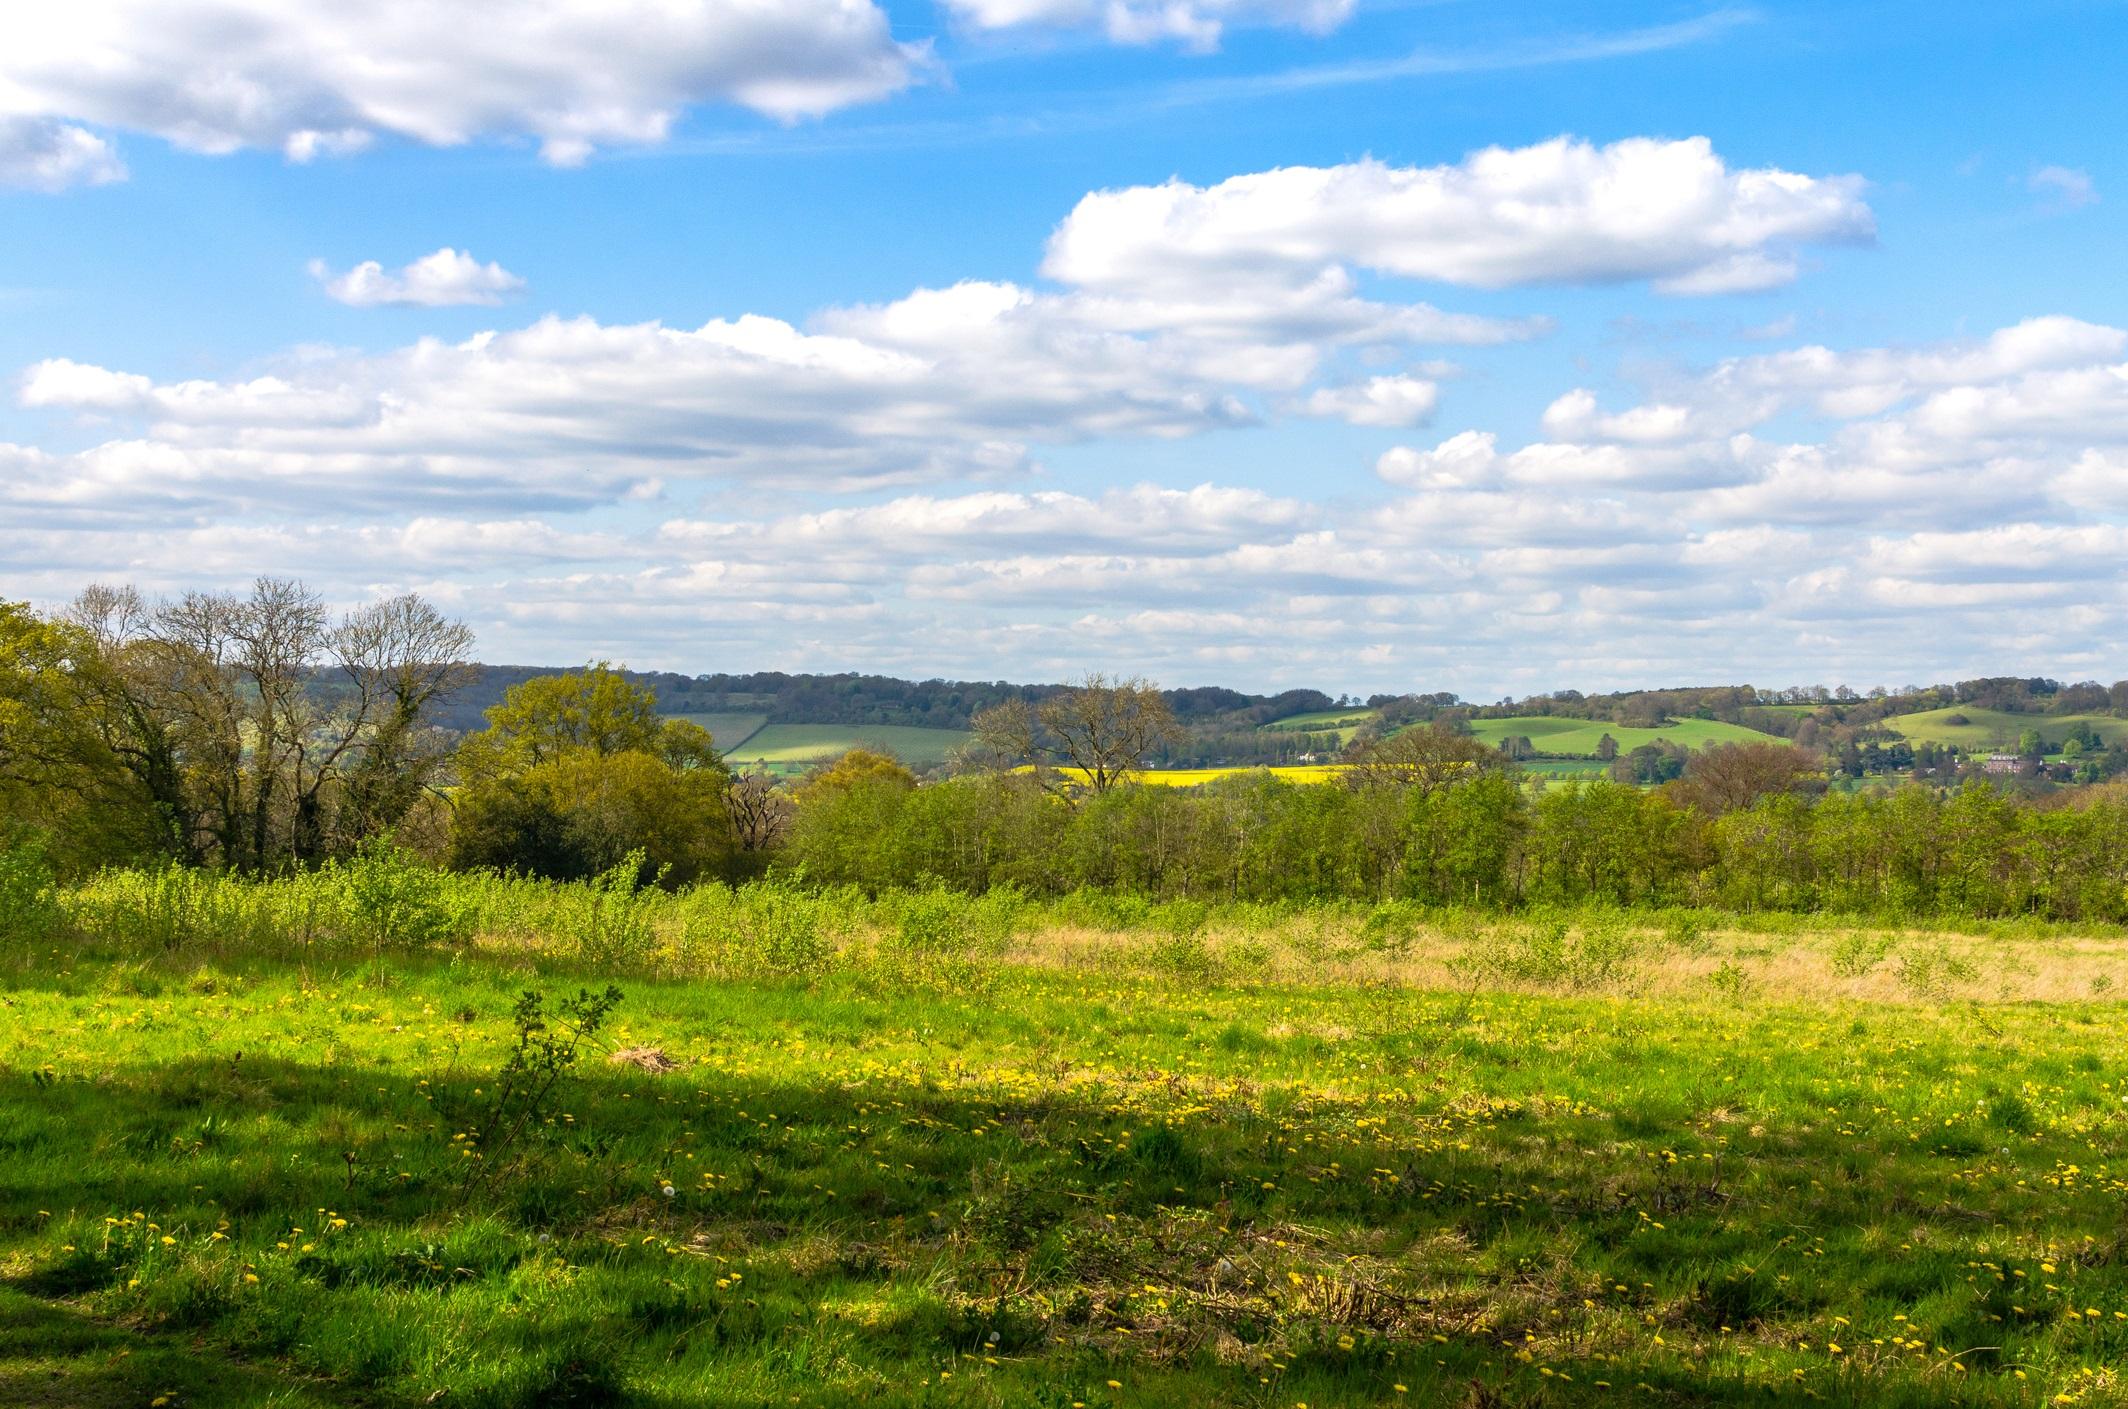 Beautiful green hills landscape